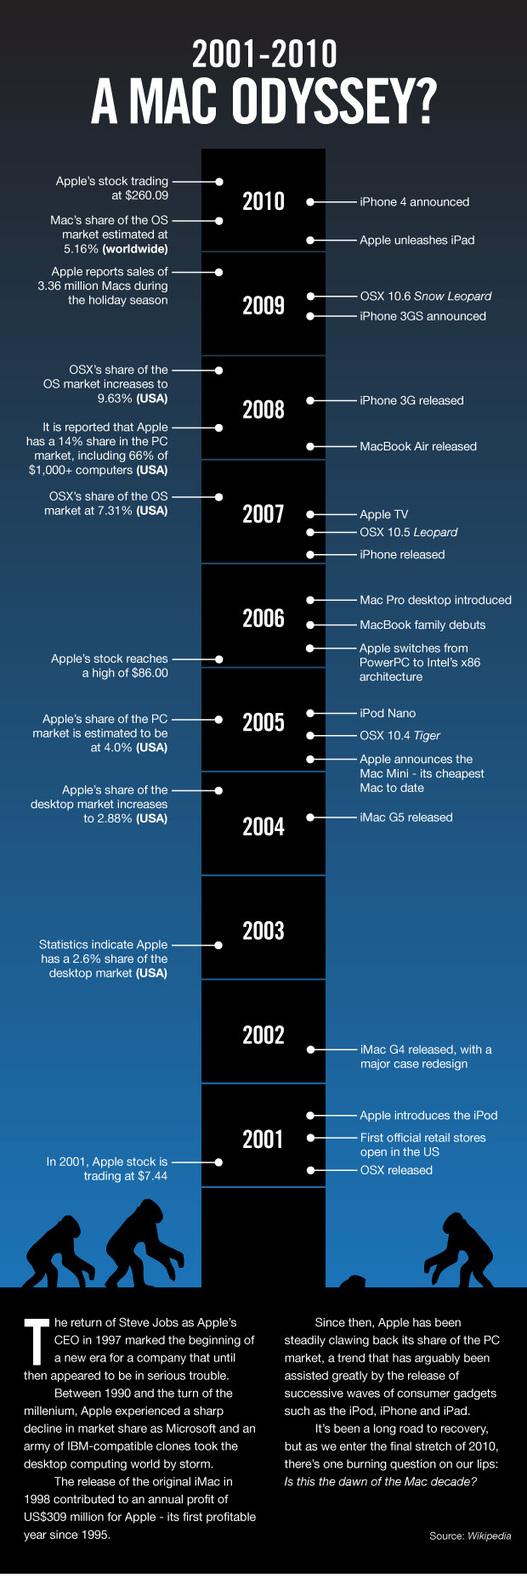 Mac Odyssey - Apple de 2001 à 2010 en 1 image